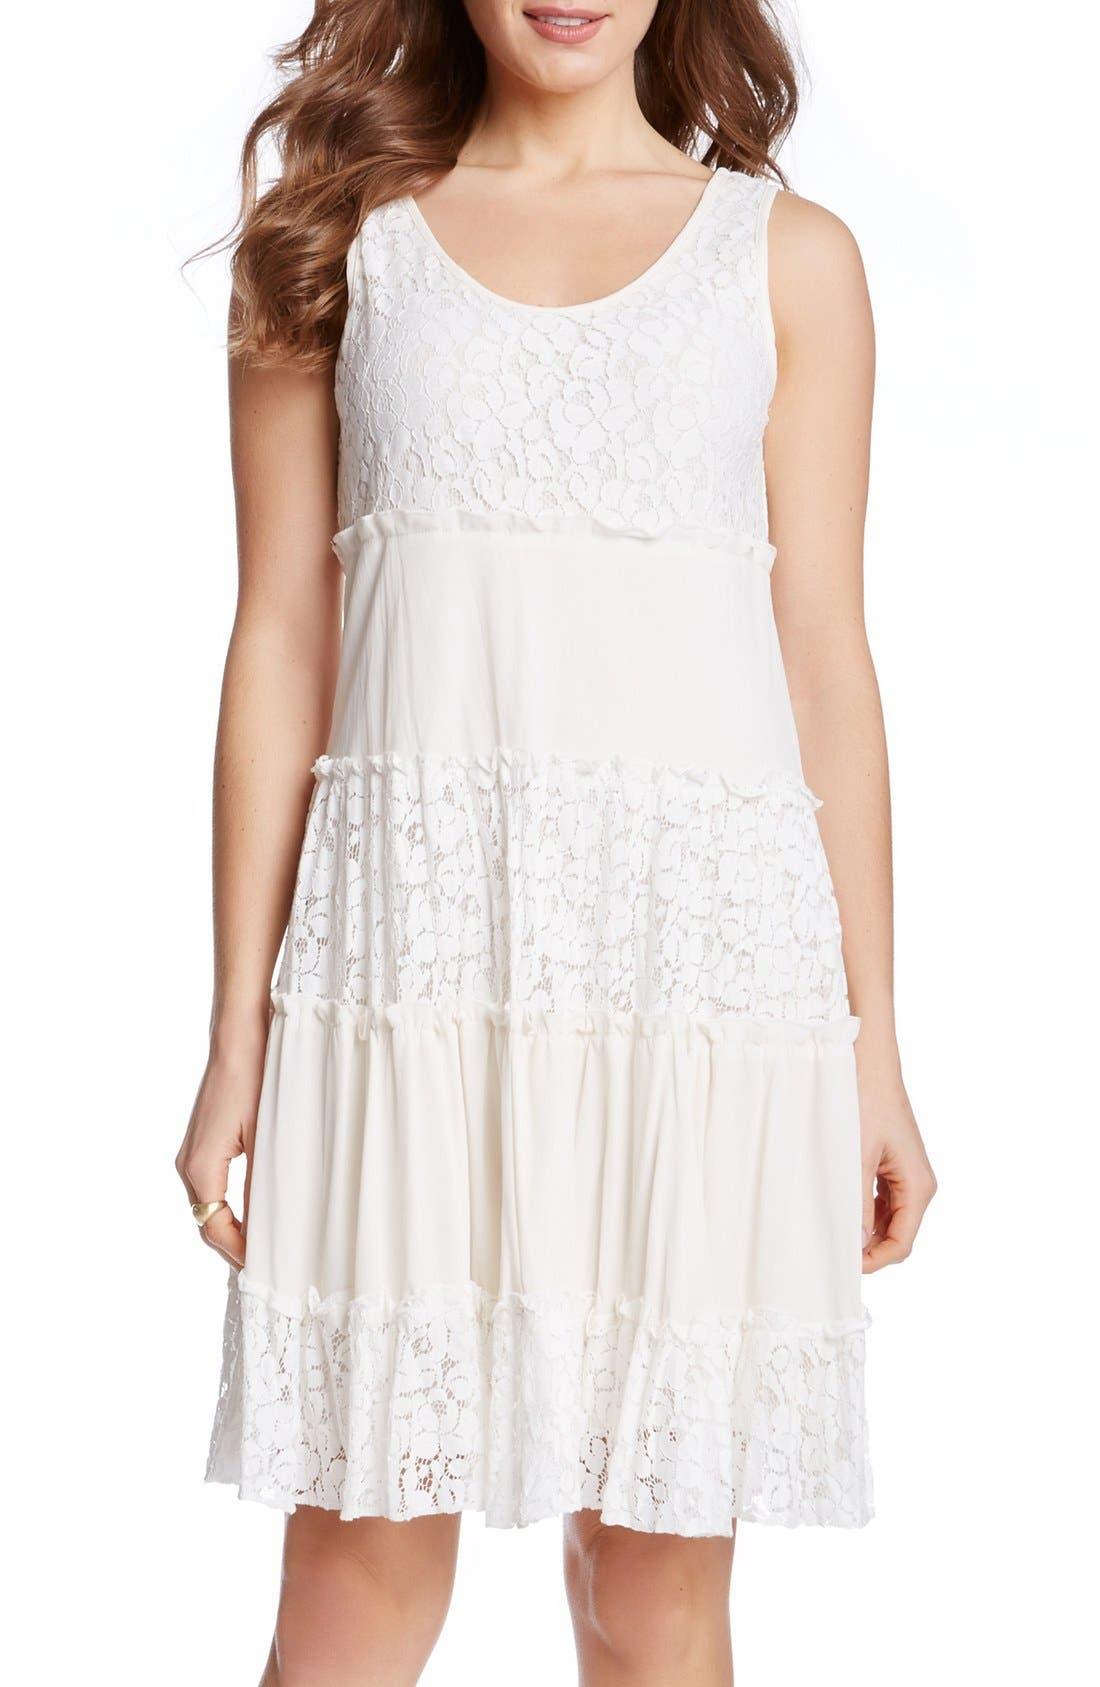 'Tara' Tiered Lace A-Line Dress,                             Main thumbnail 1, color,                             Cream